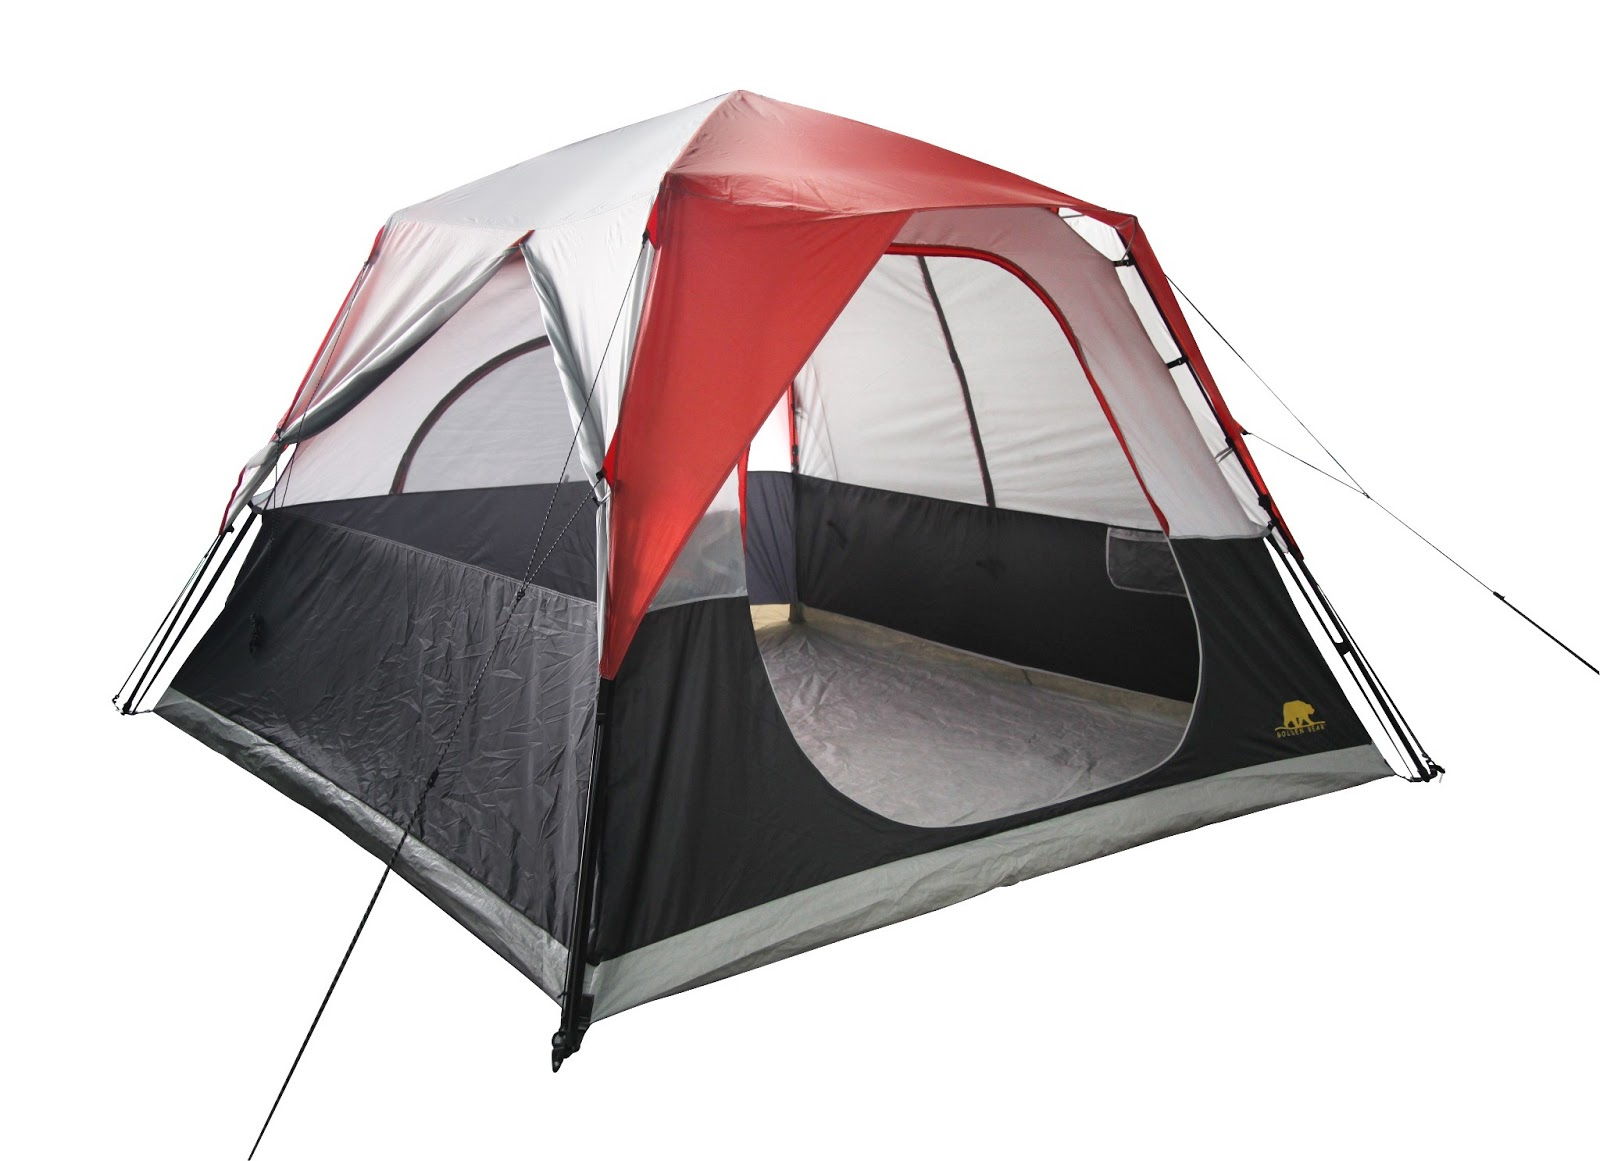 Big 5 Golden Bear Speed-up Tents  sc 1 st  North Star Sports & North Star Sports: Big 5 Golden Bear Speed-up Tents